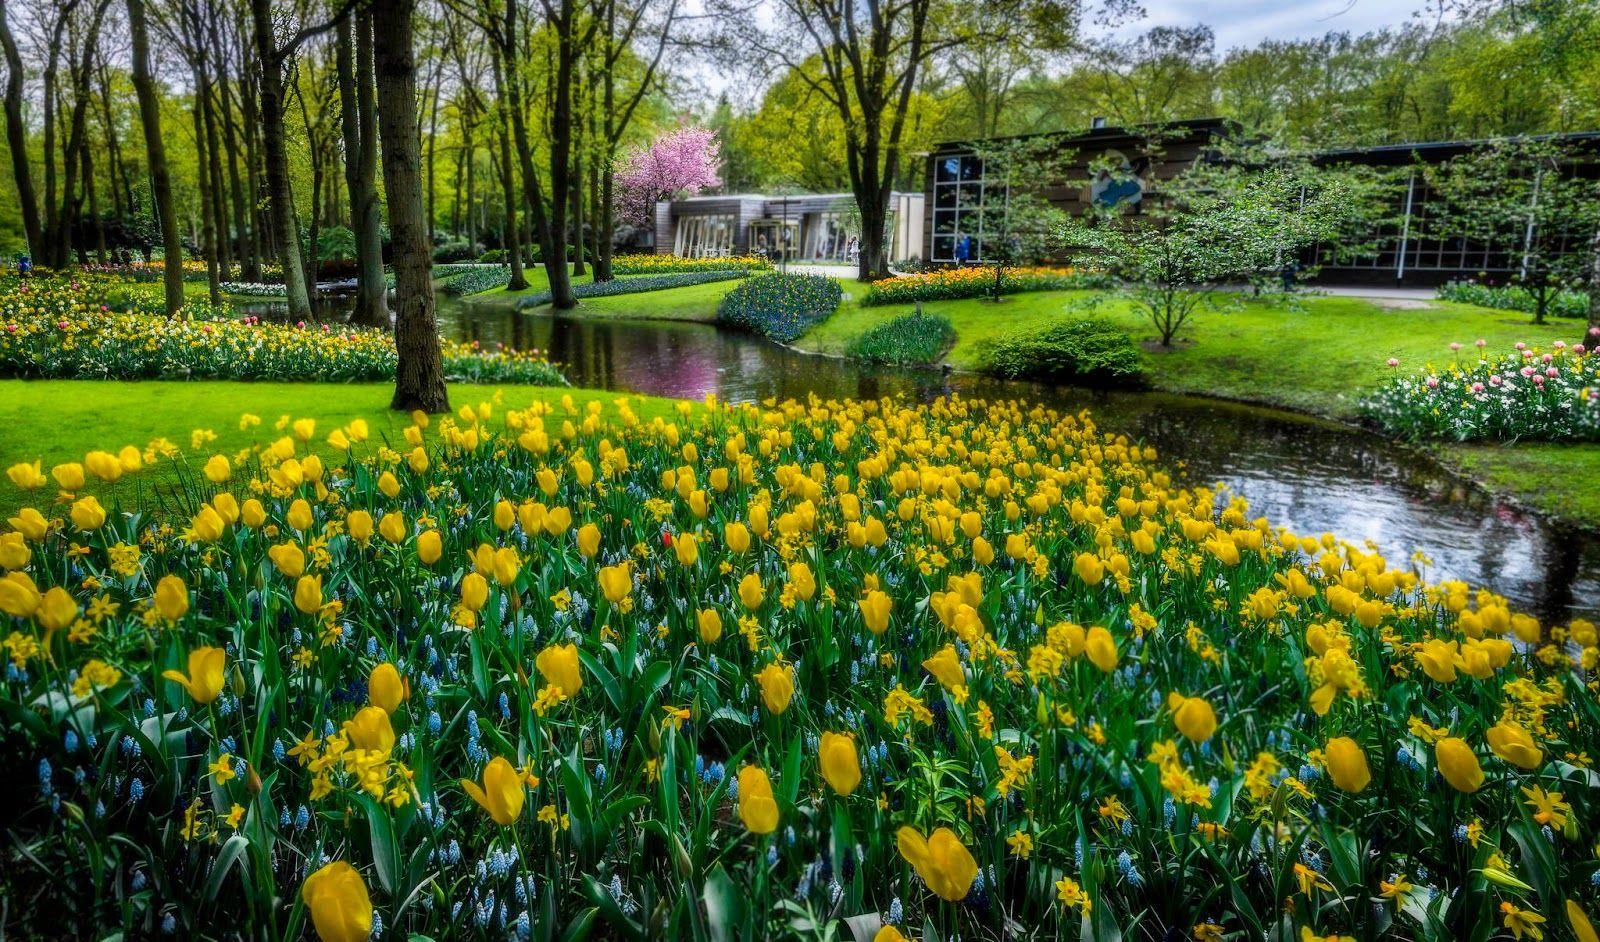 20 fotos de animales flores paisajes aves y autos - Diseno de paisajes y jardines ...